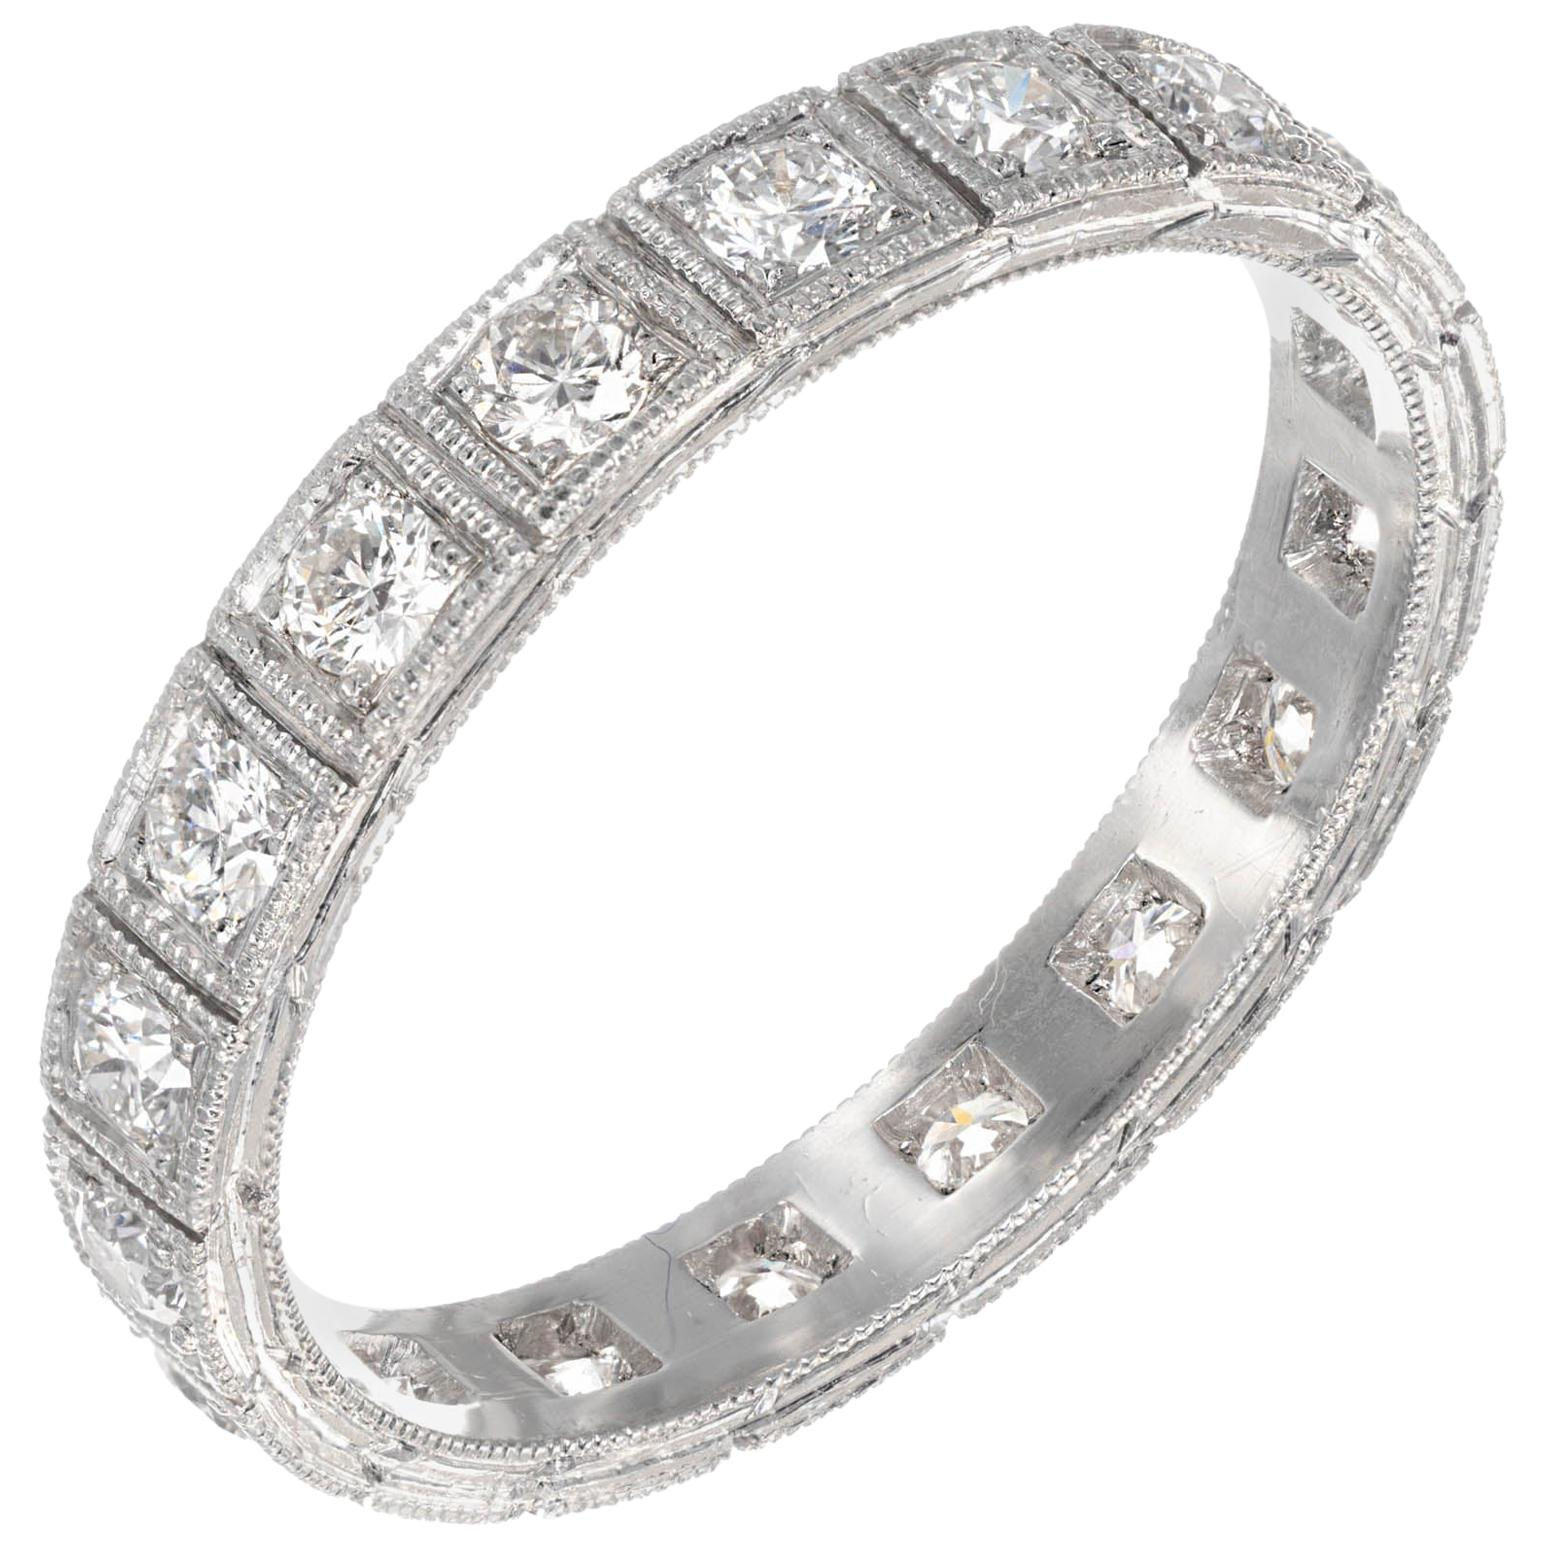 Peter Suchy .54 Carat Diamond Platinum Eternity Wedding Band Ring